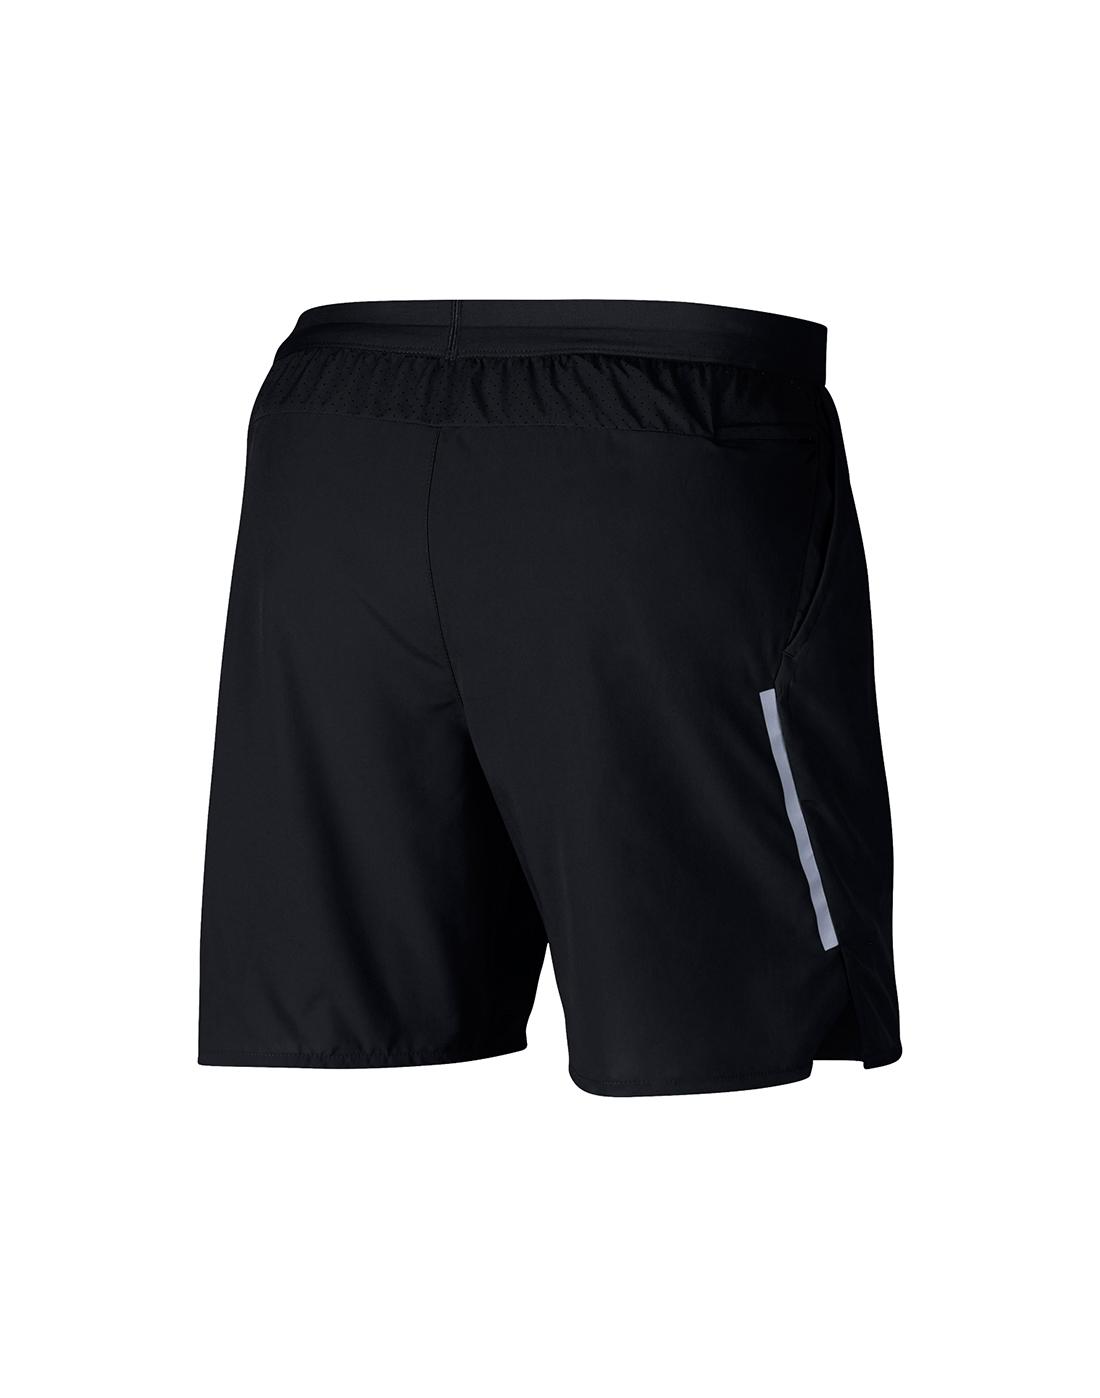 c3155c1b44e5 Nike Mens 7 Inch Flex Stride Grphic Short